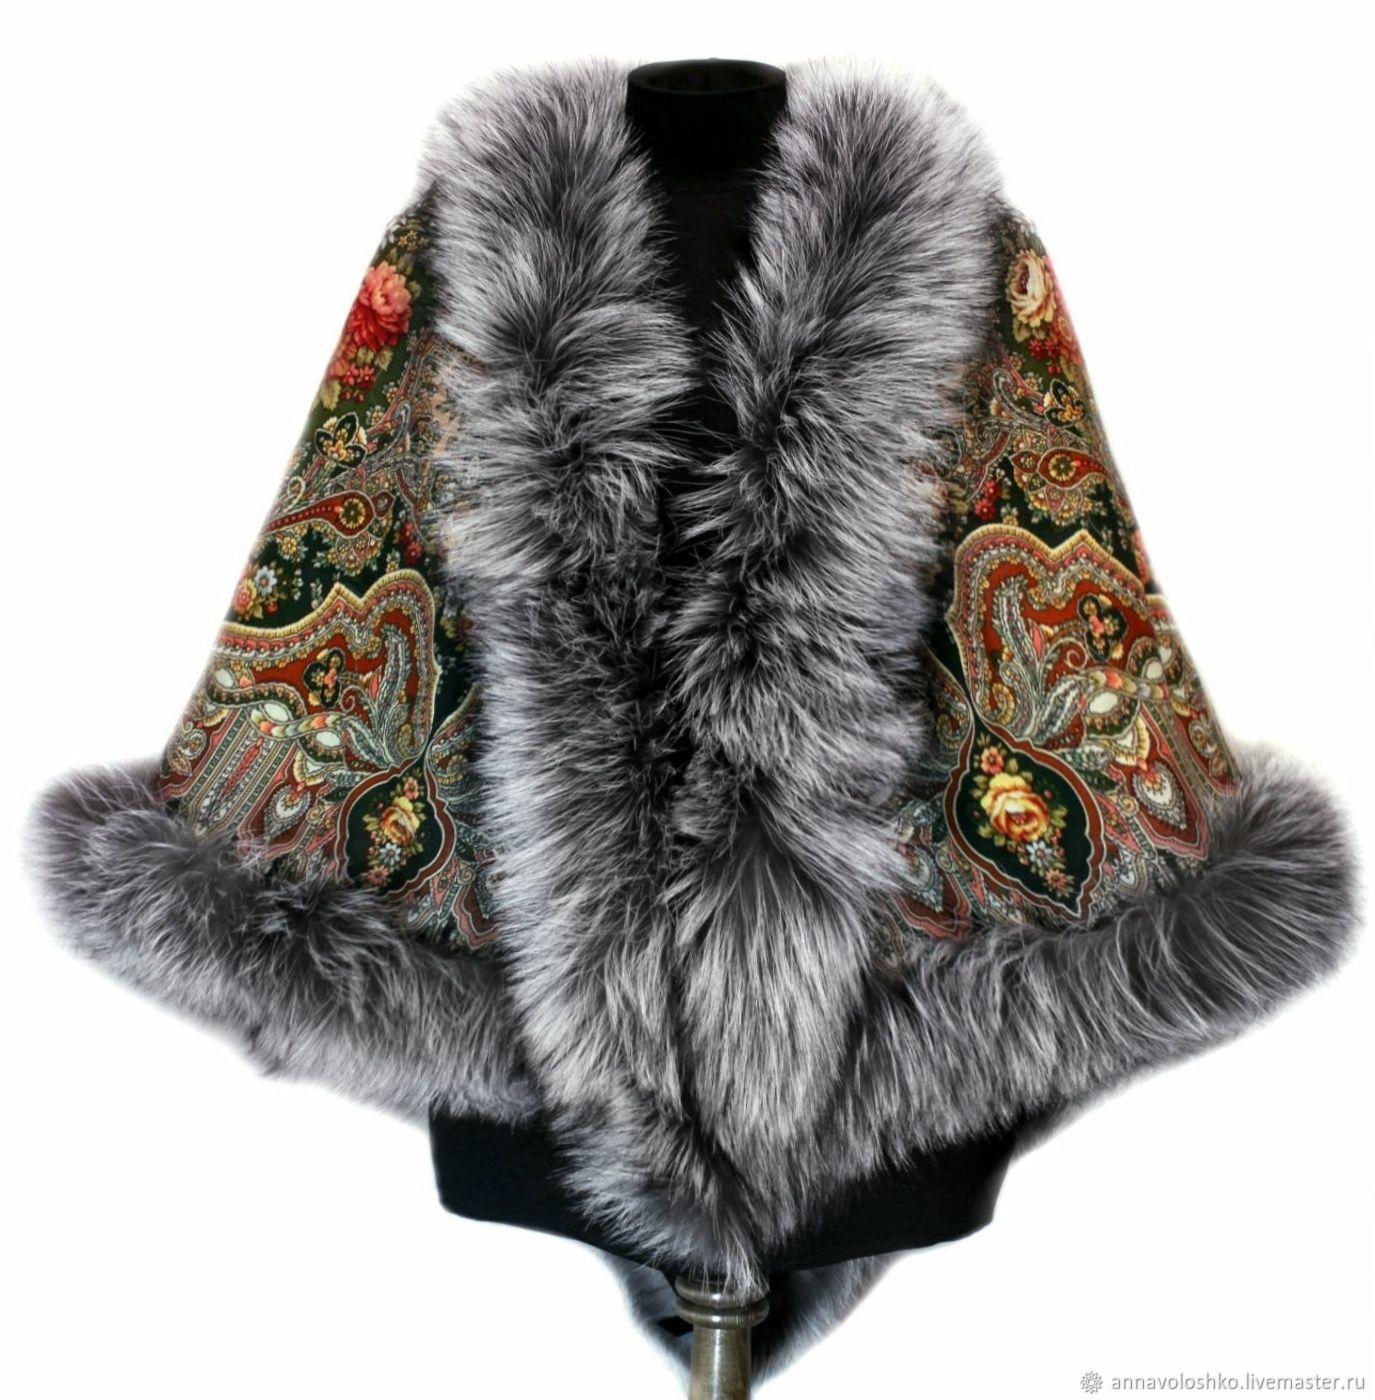 Pavlovo Posad shawl 'Almond', art.1064, Shawls1, Moscow,  Фото №1